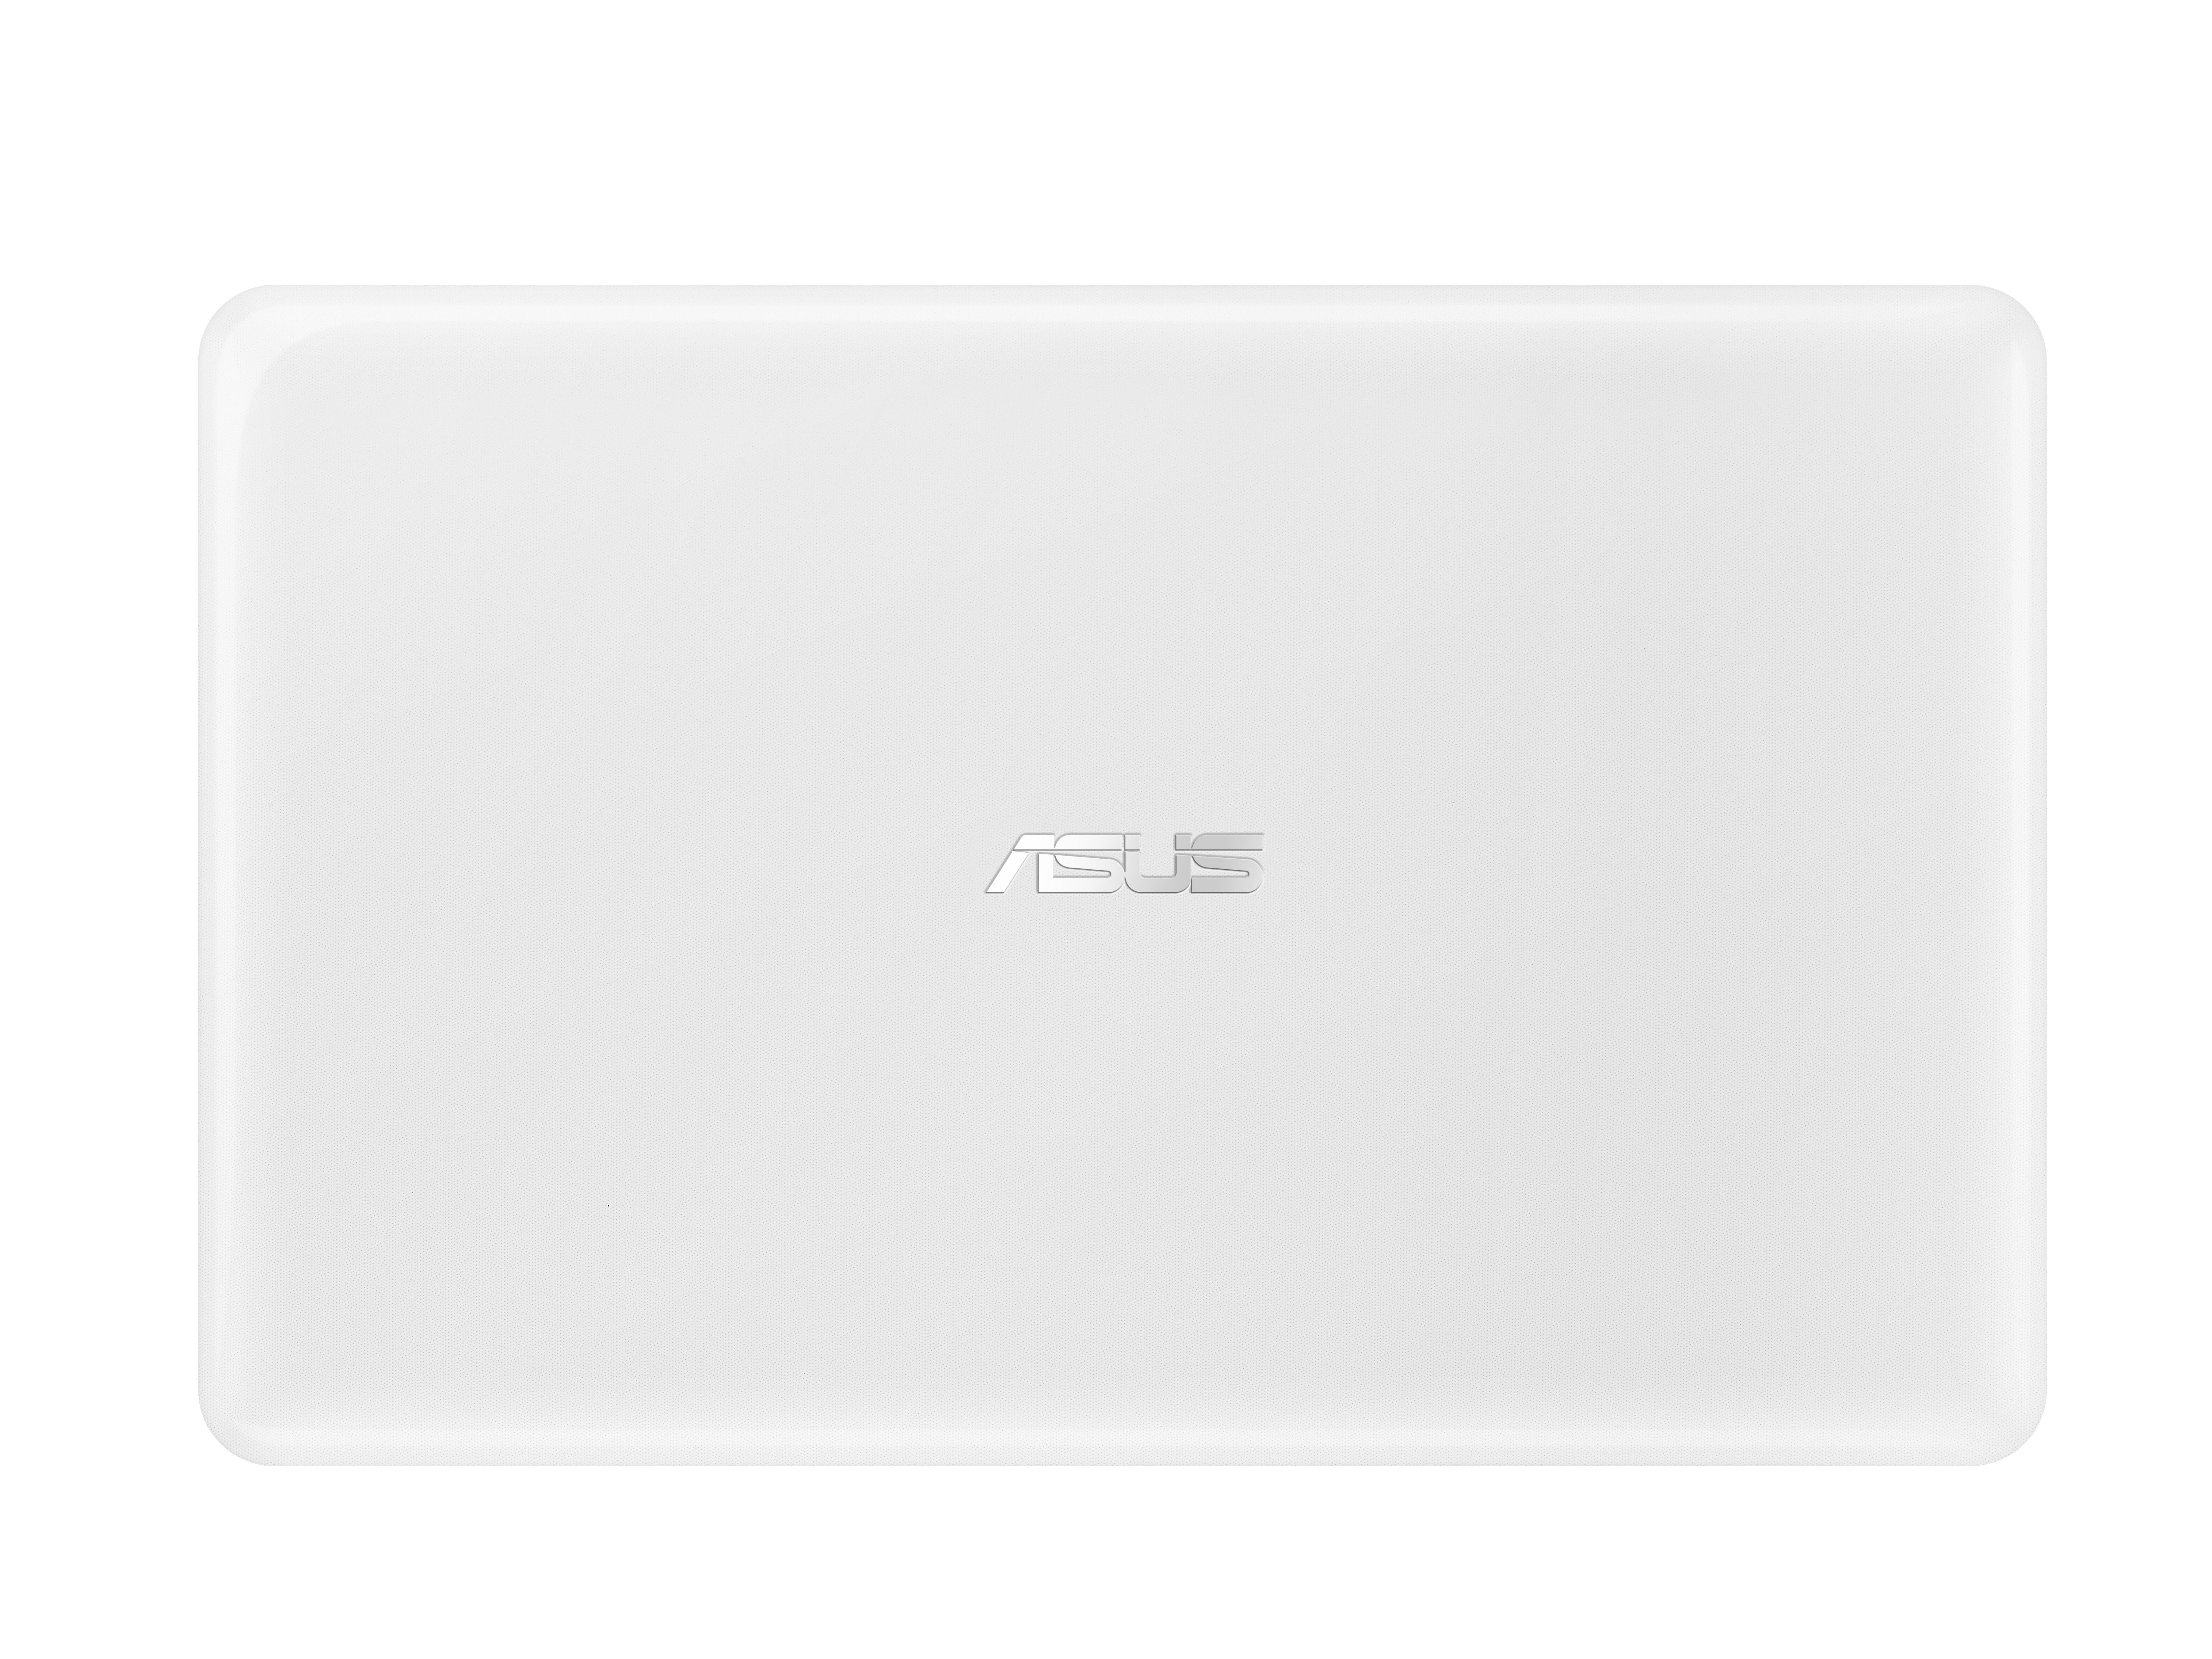 "ASUS A556UA-DM143 2.3GHz i5-6200U 15.6"" 1920 x 1080Pixel Bianco Computer portatile notebook/portatile"